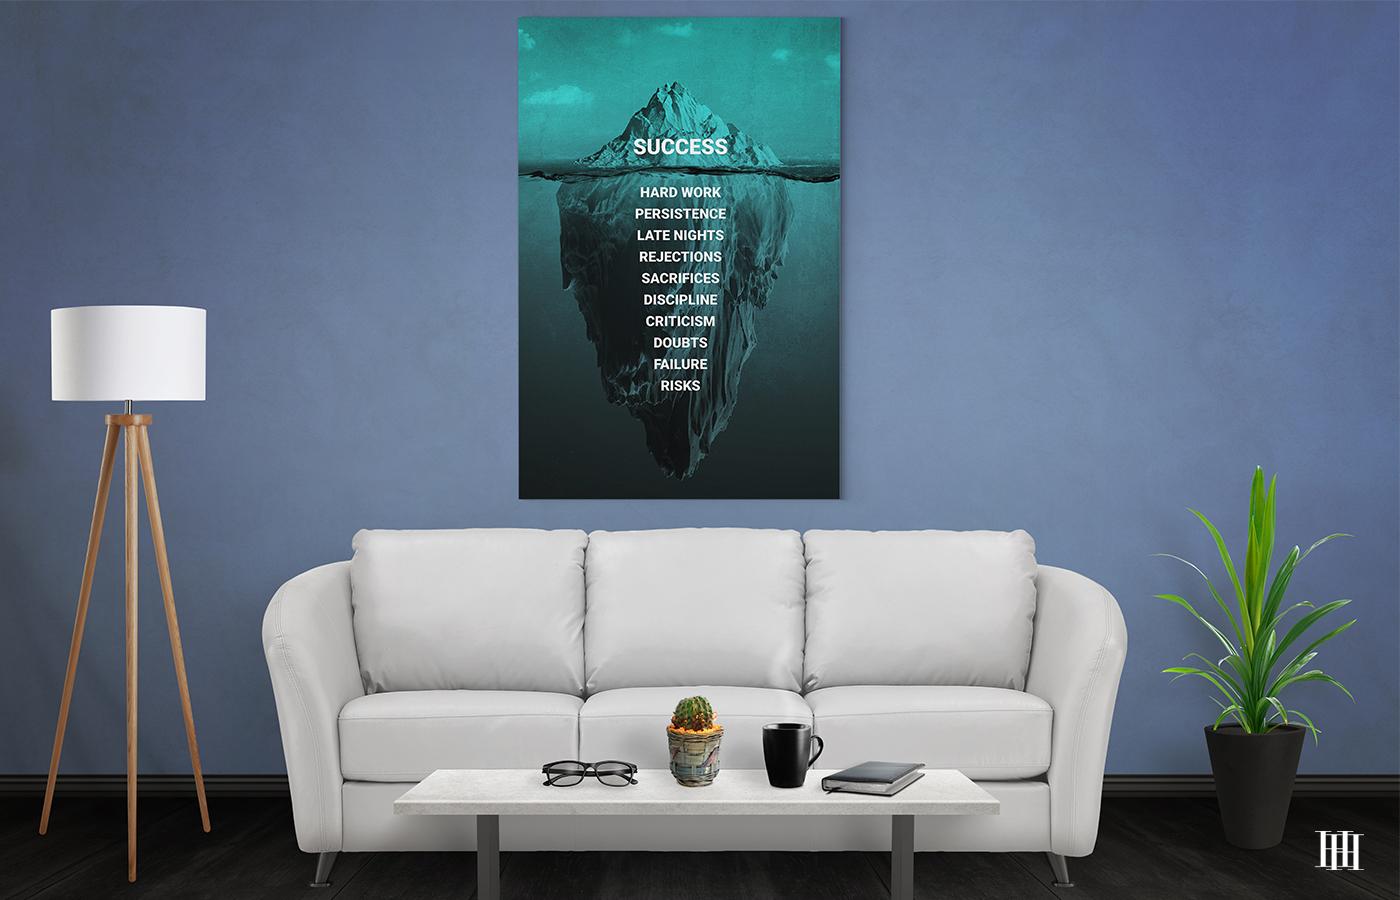 iceberg success canvas wall art the presidential hustle